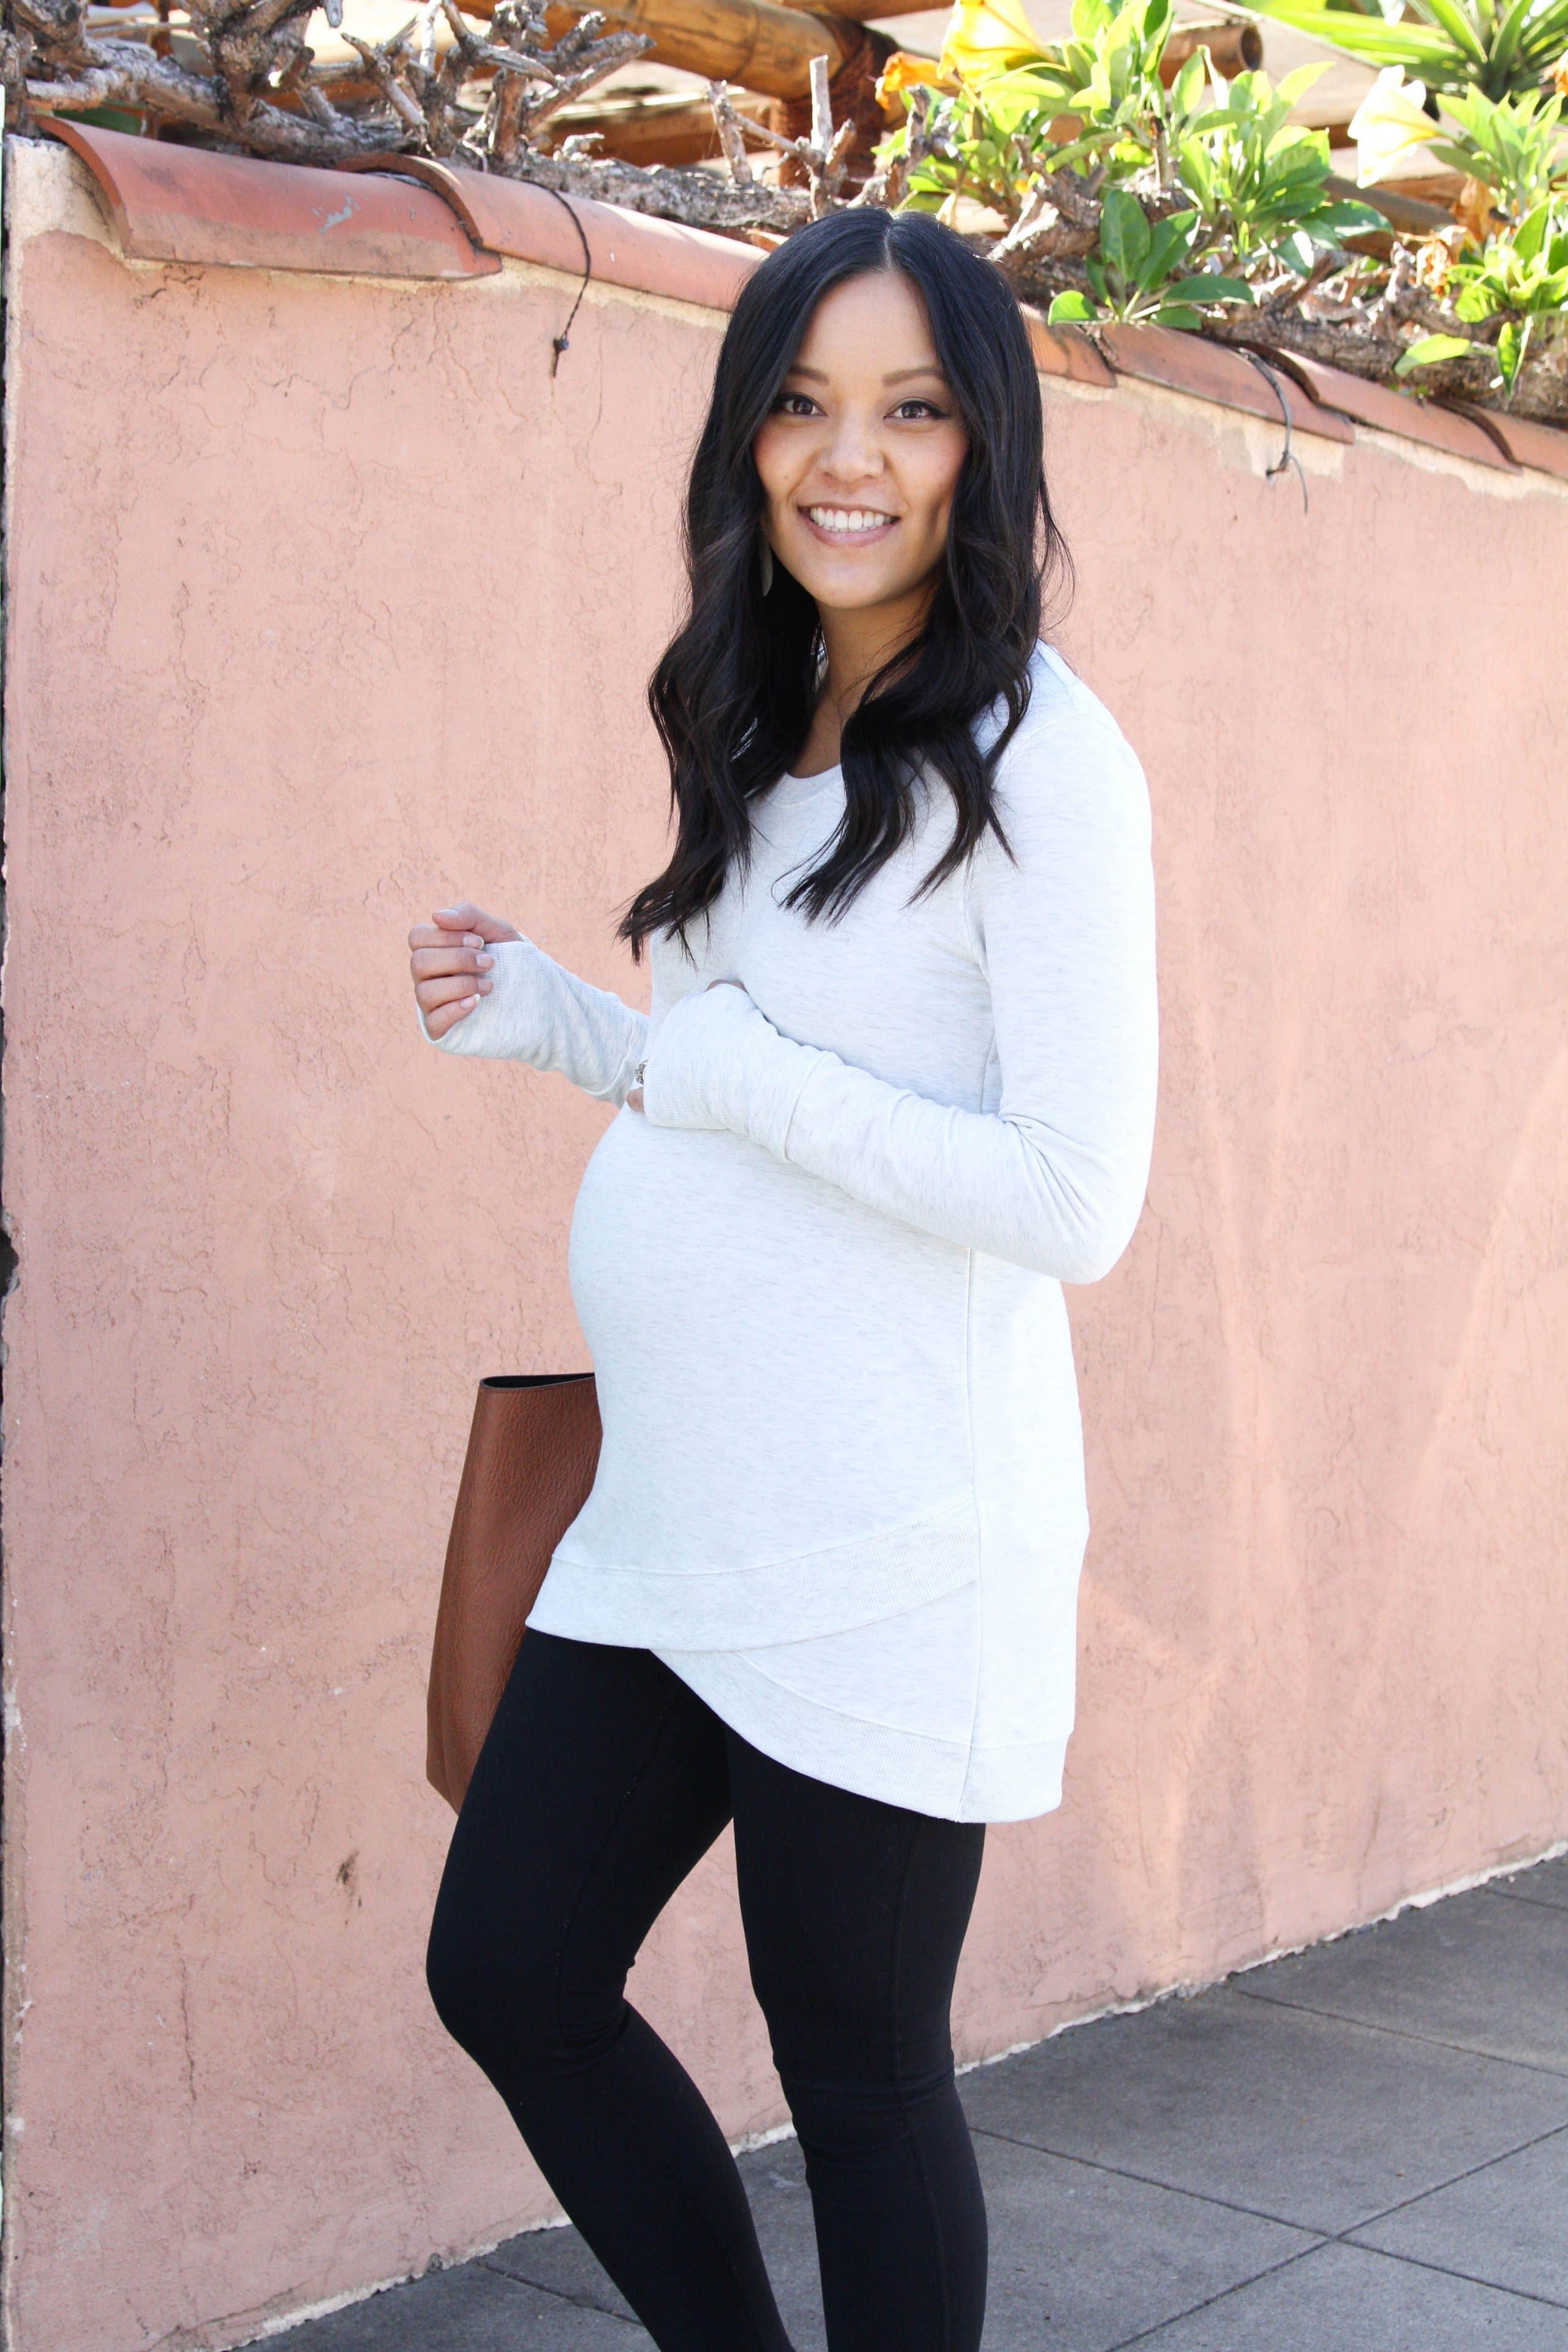 Maternity Athleisure: Cross Hem Sweatshirt + Black Leggings + Tote